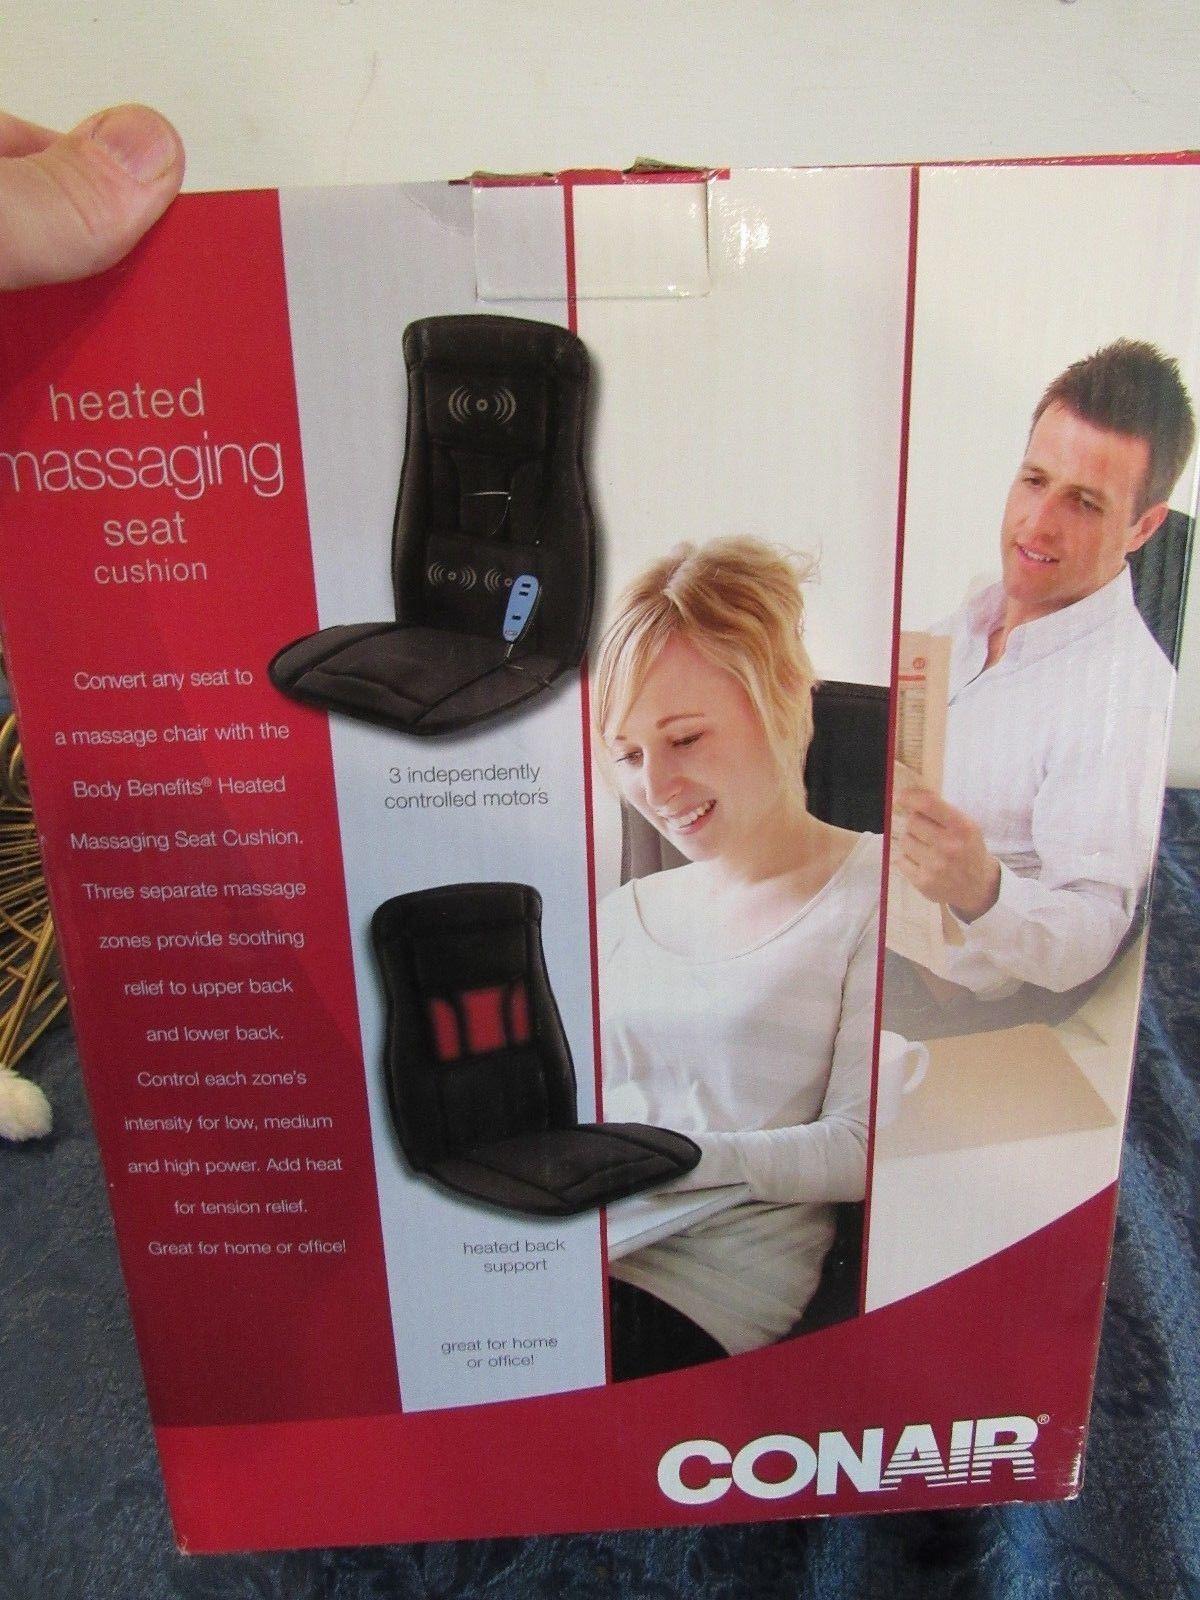 Conair Electric Massage Chair Pad Seat Heat Office Cushion Back Neck Vibration